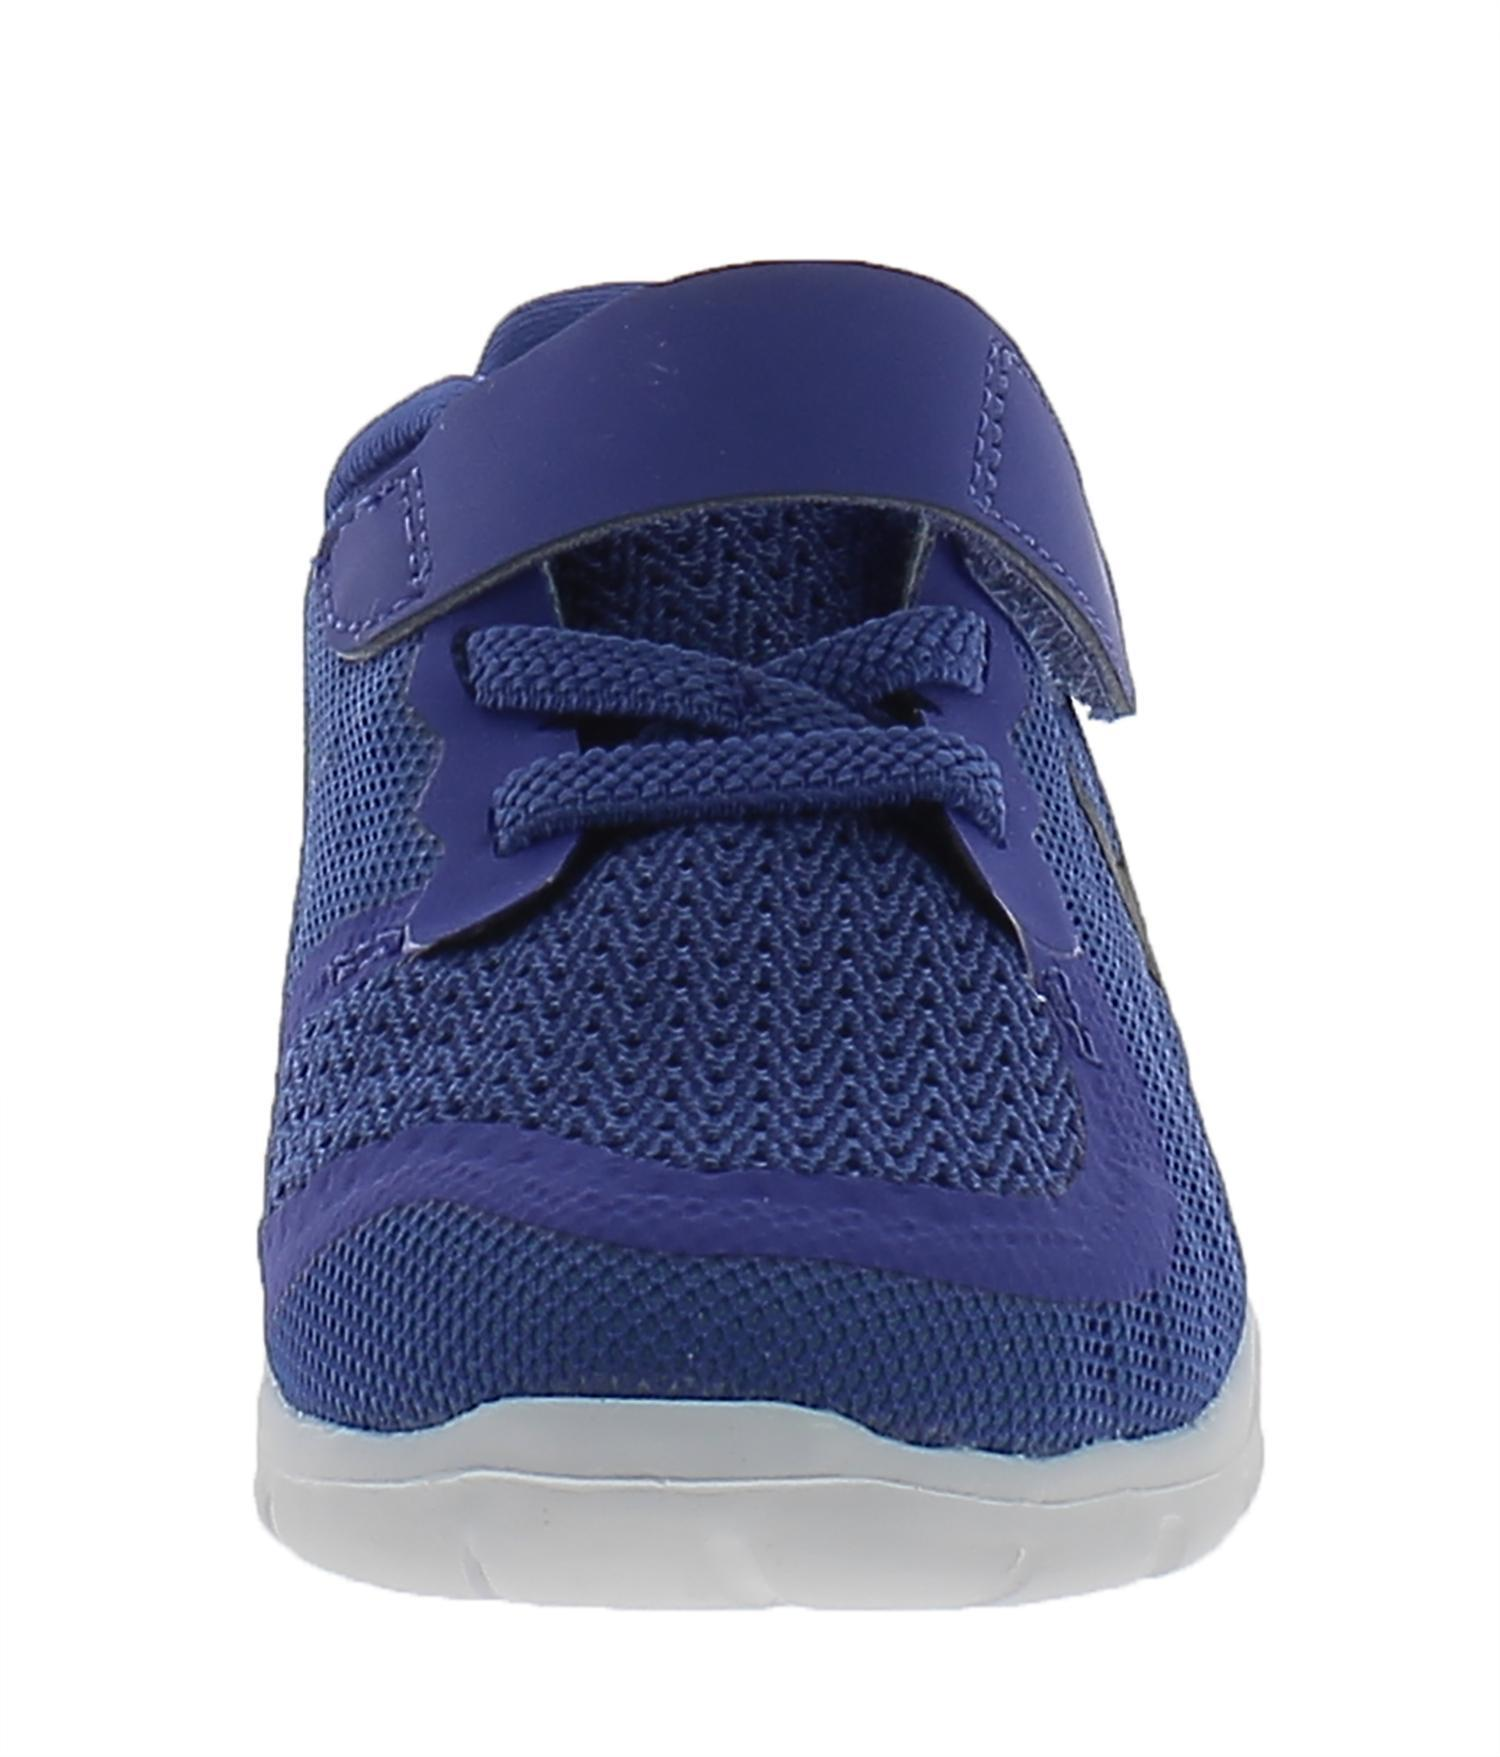 nike free 5 tdv scarpe sportive bambino blu pelle tela strappi 725107